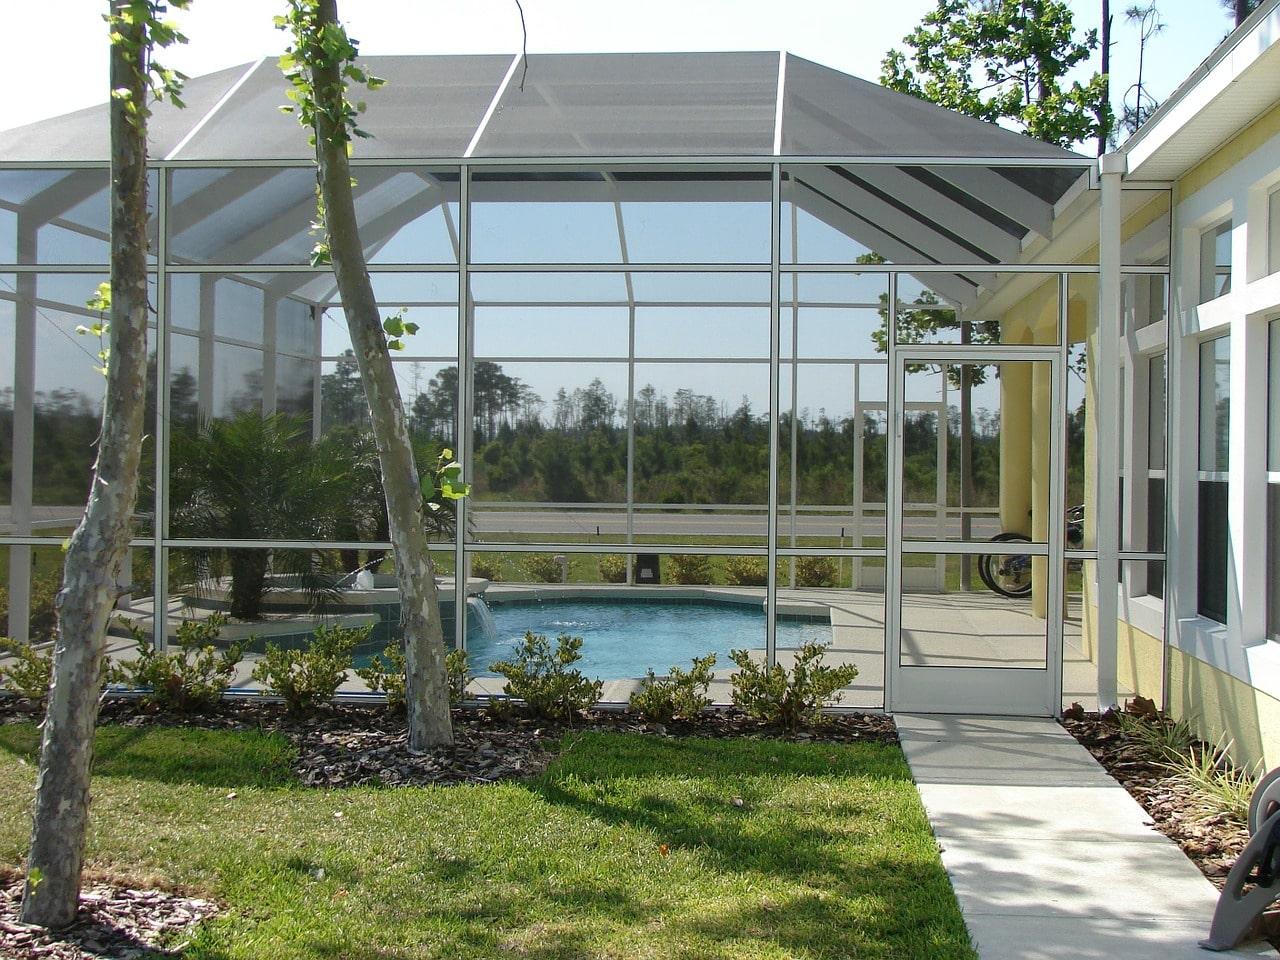 Design Concept le fabricant qui ravira votre piscine avec un abri